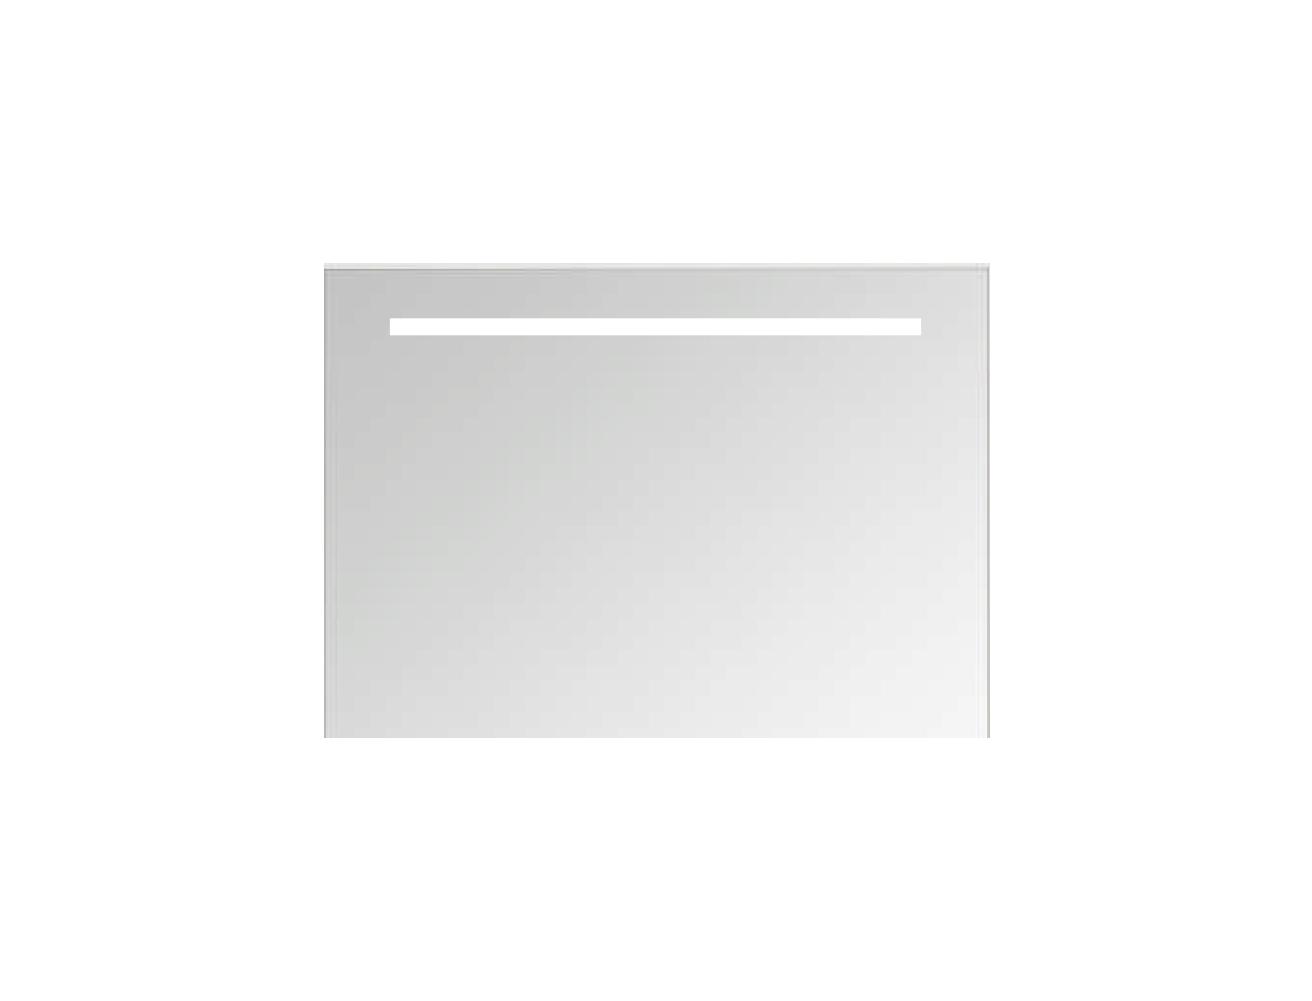 Basic spiegel op alu frame met geintegreerde led verlichting - 800x30mm (bxd)